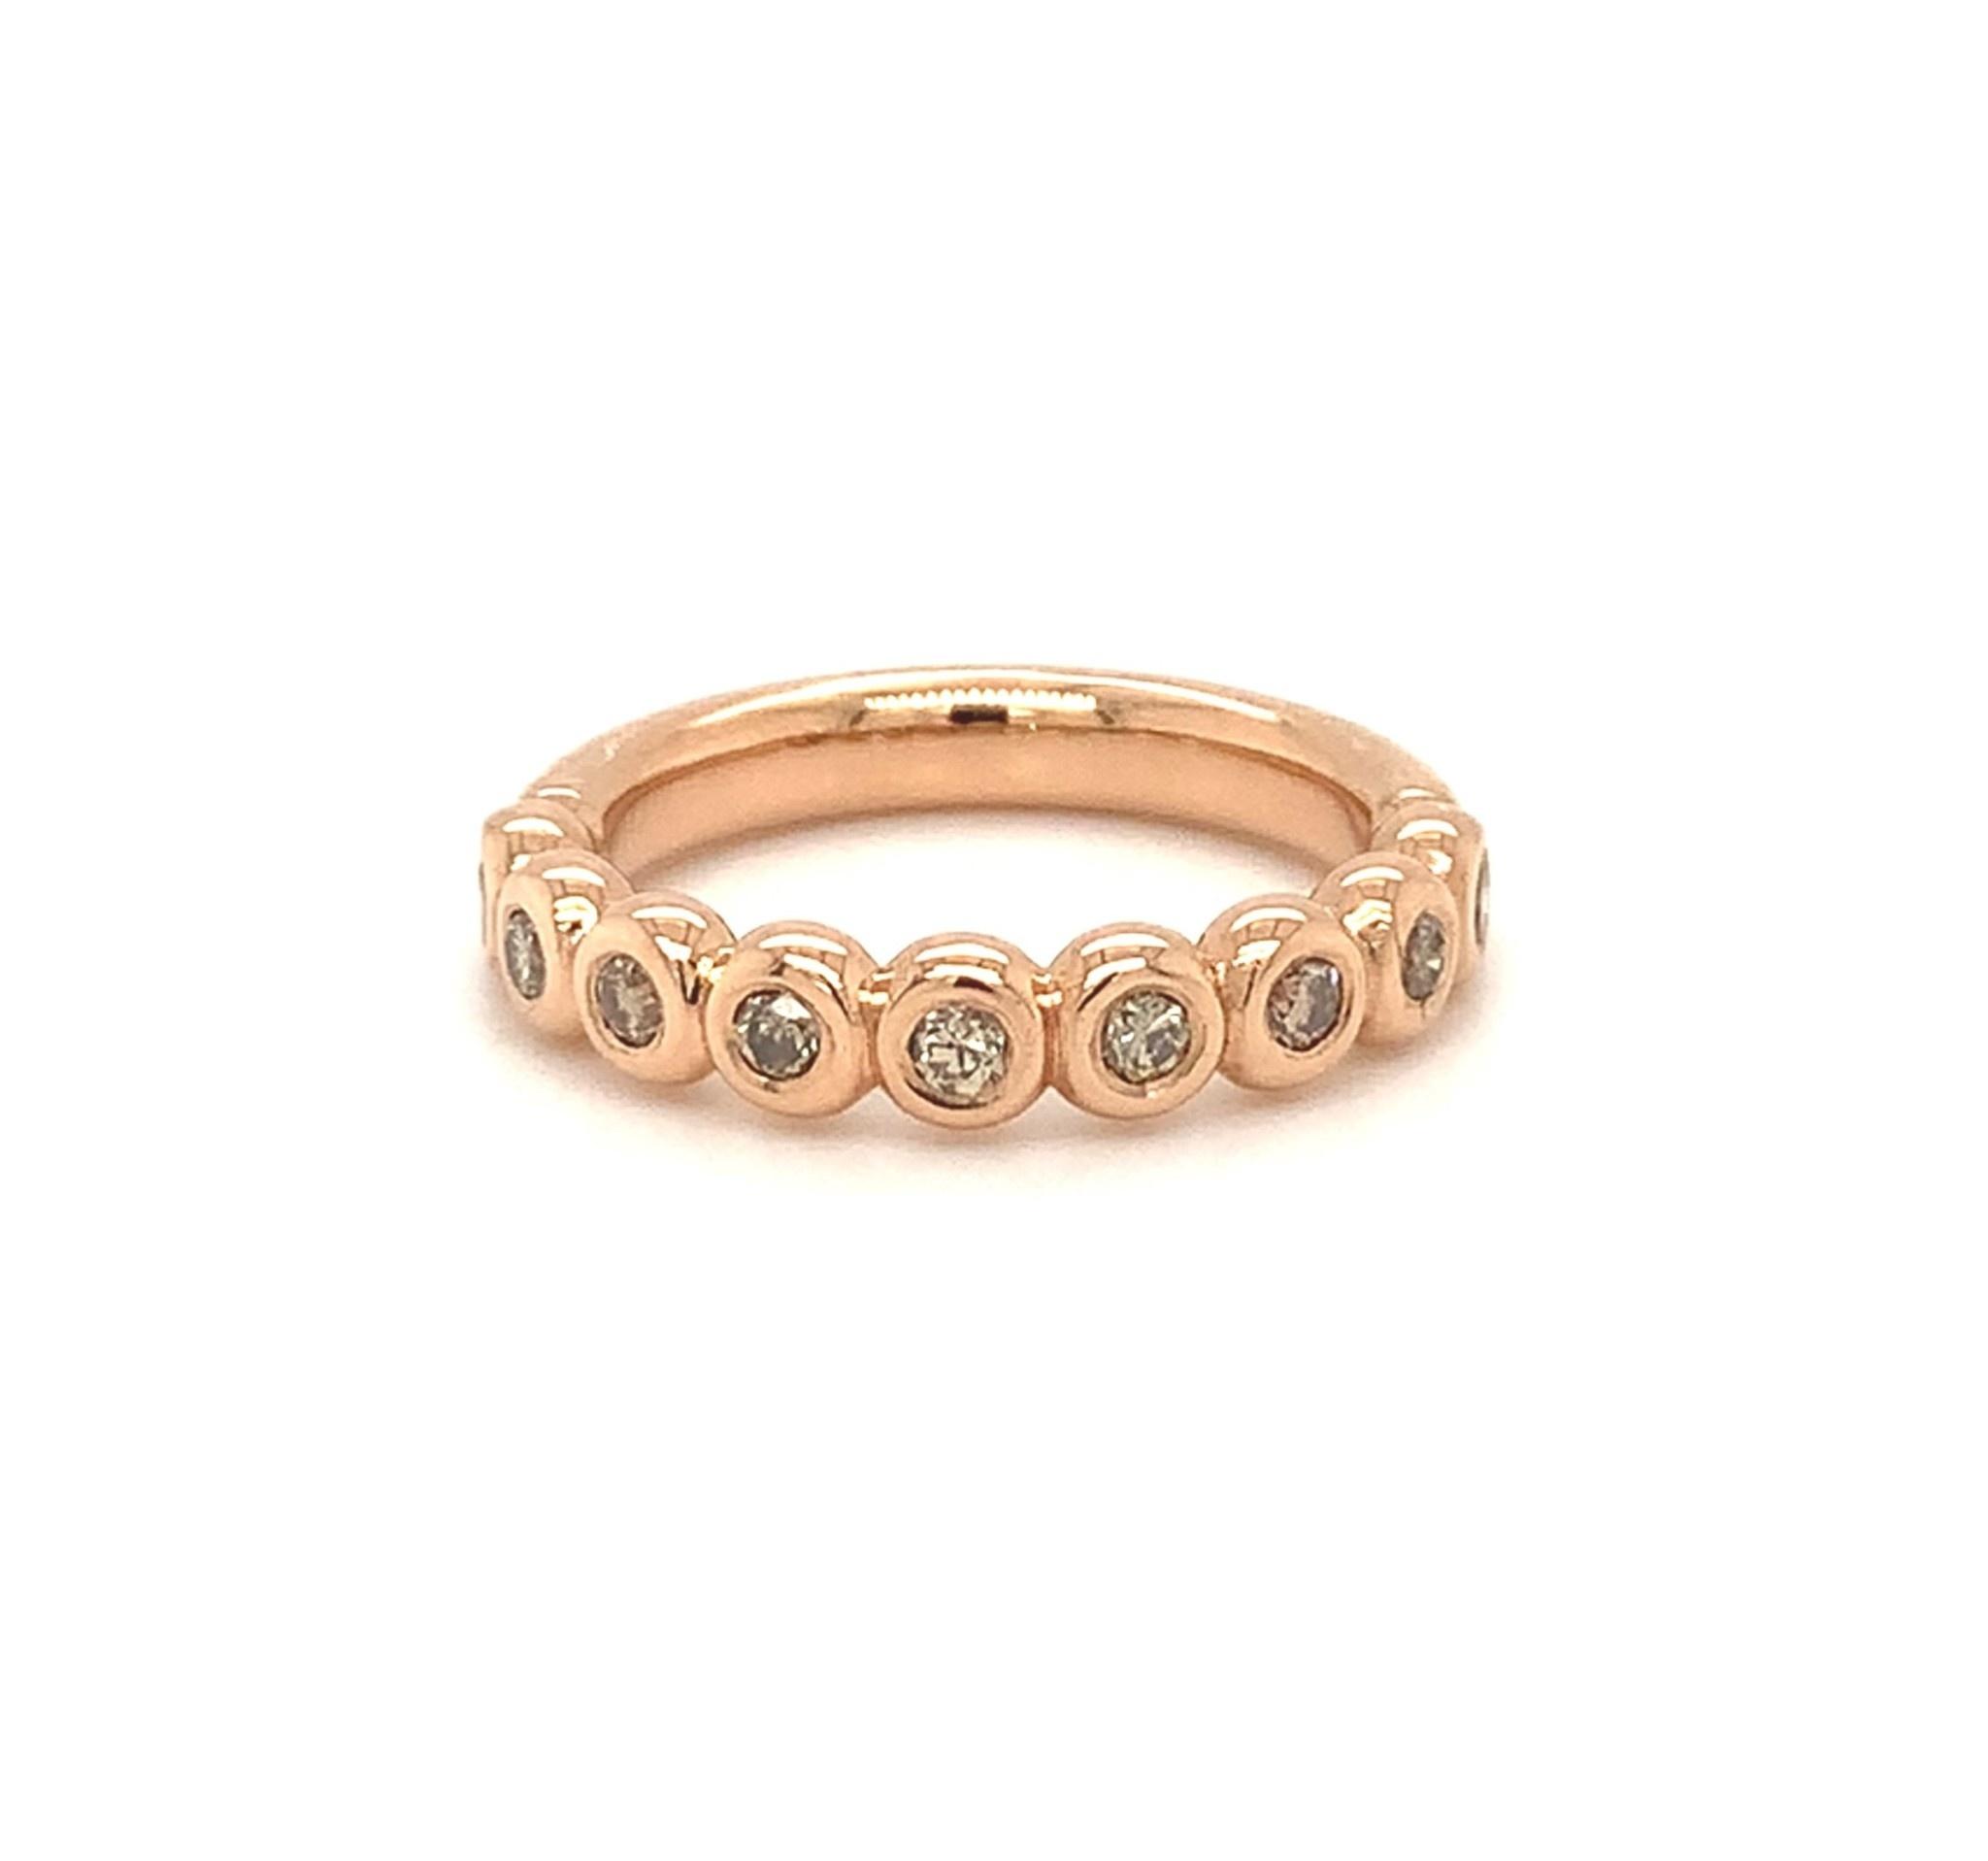 ROEMER by Bregje ROEMER by Bregje Roodgouden ring met bruine diamant